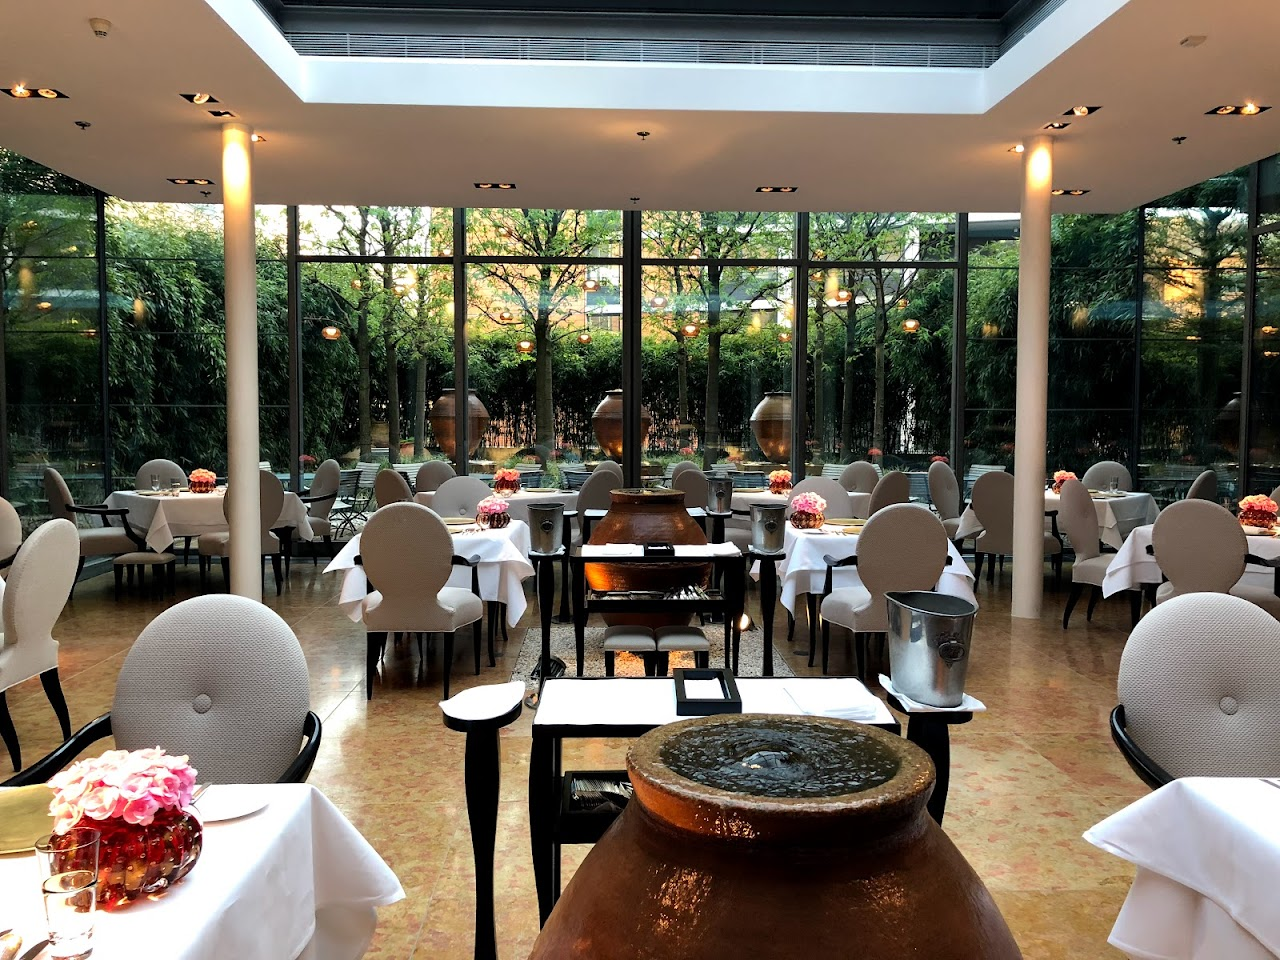 facil at the mandala hotel best restaurants firstguide. Black Bedroom Furniture Sets. Home Design Ideas